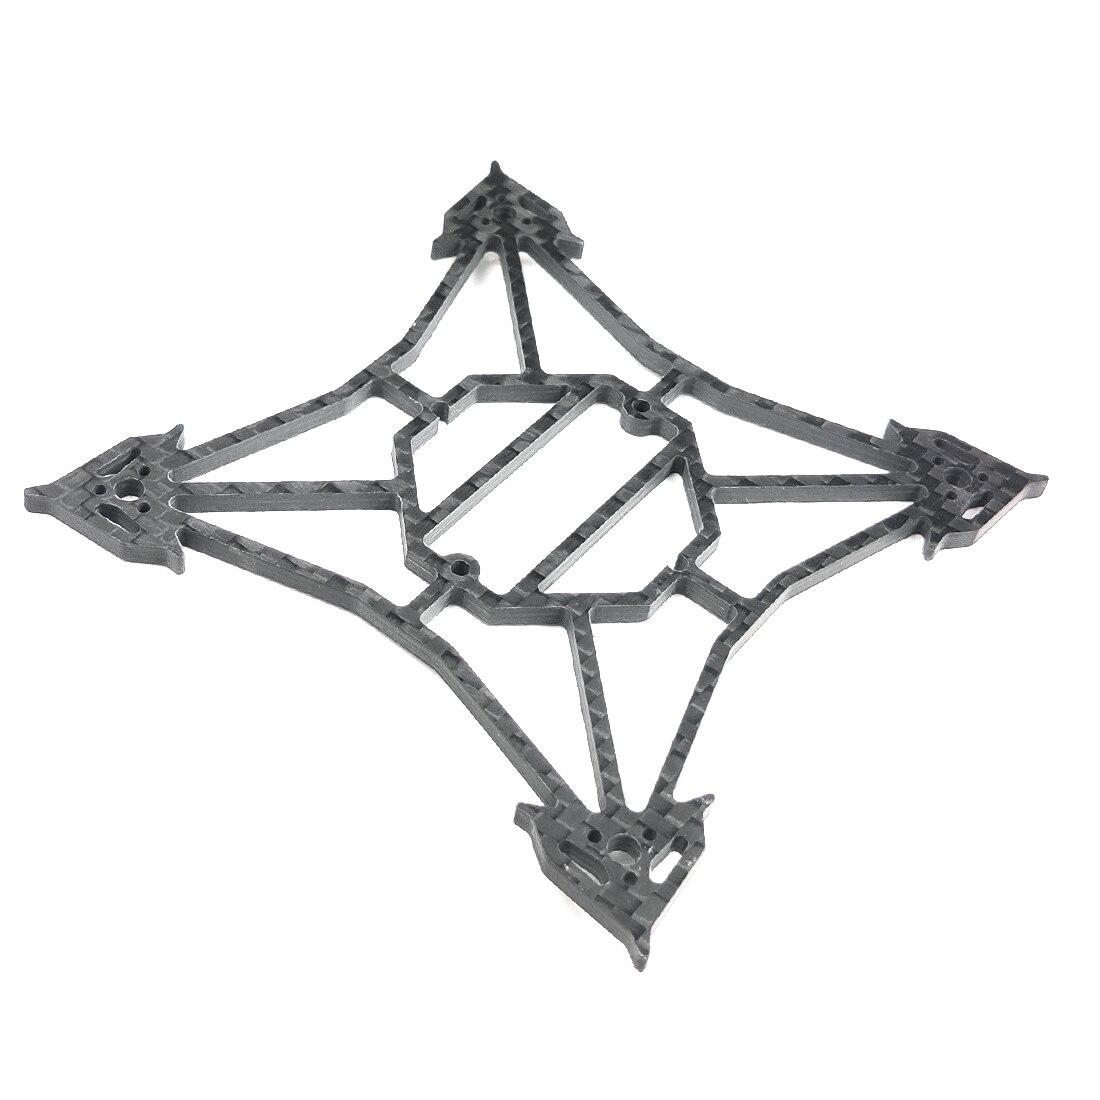 Happymodel Larva X Frame Kit 100 мм Колесная база 2-3S 2,5 дюйма бесщеточный FPV гоночный Дрон 3 мм углеродное волокно стойка